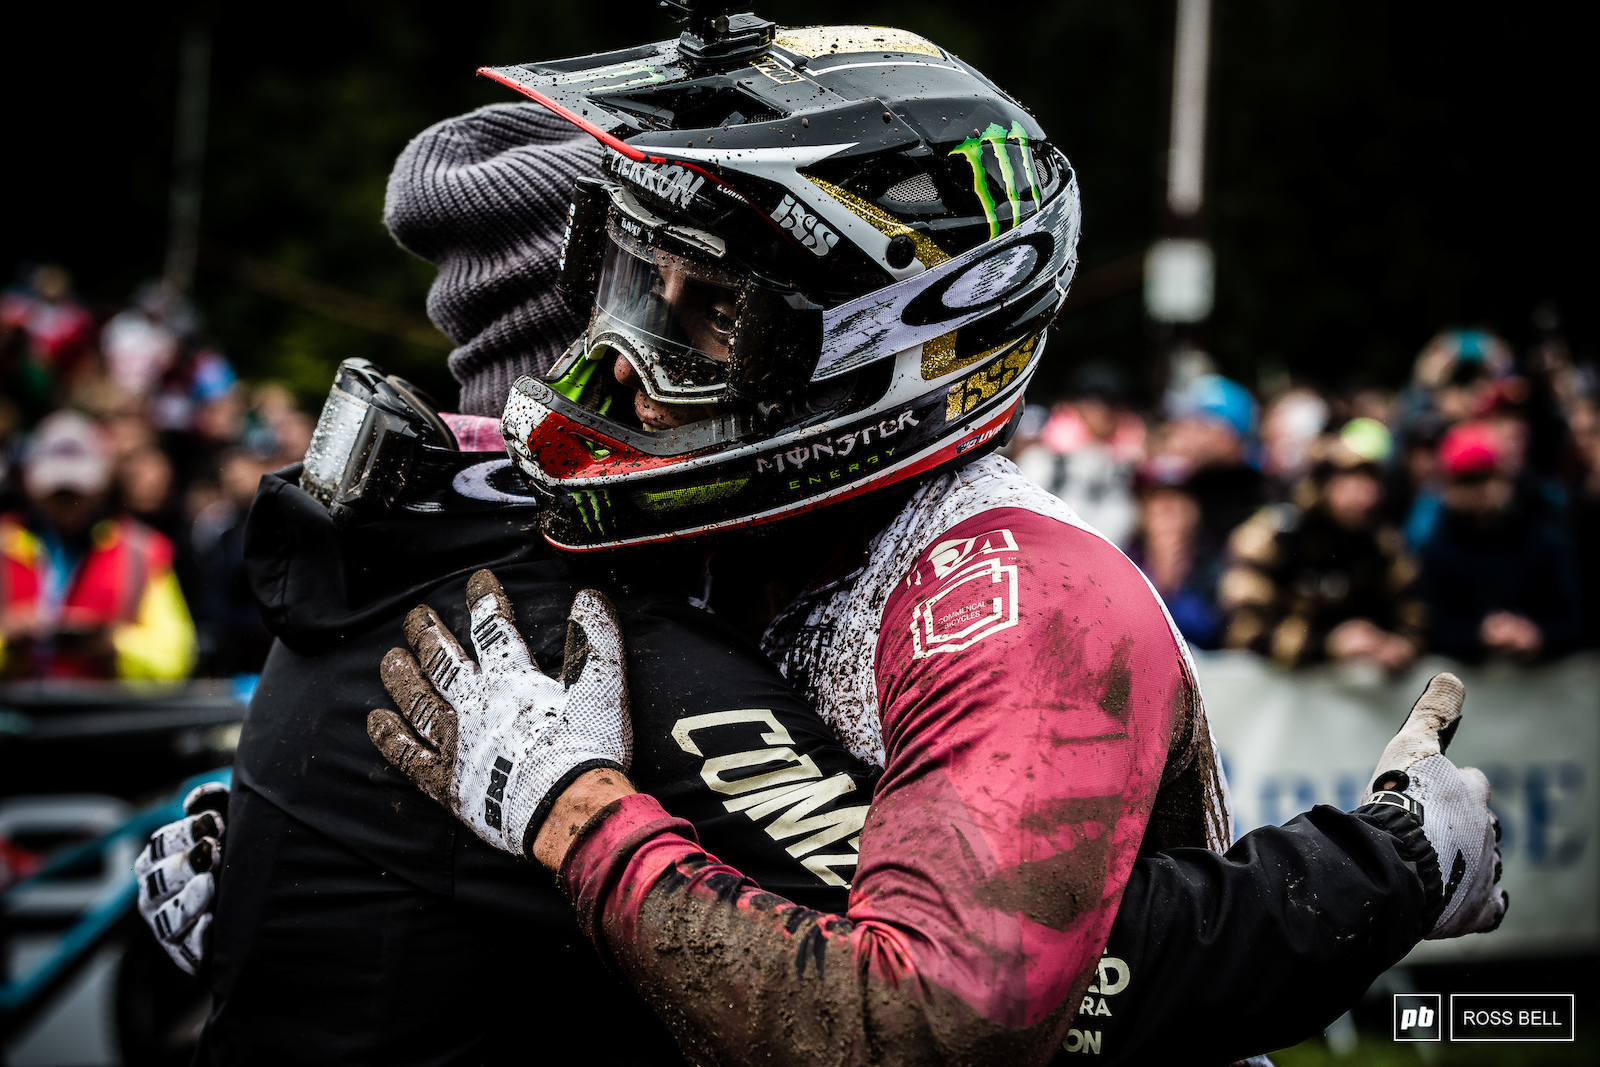 Amaury Pierron congratulates team mate Remi Thirion on a return to the podium.